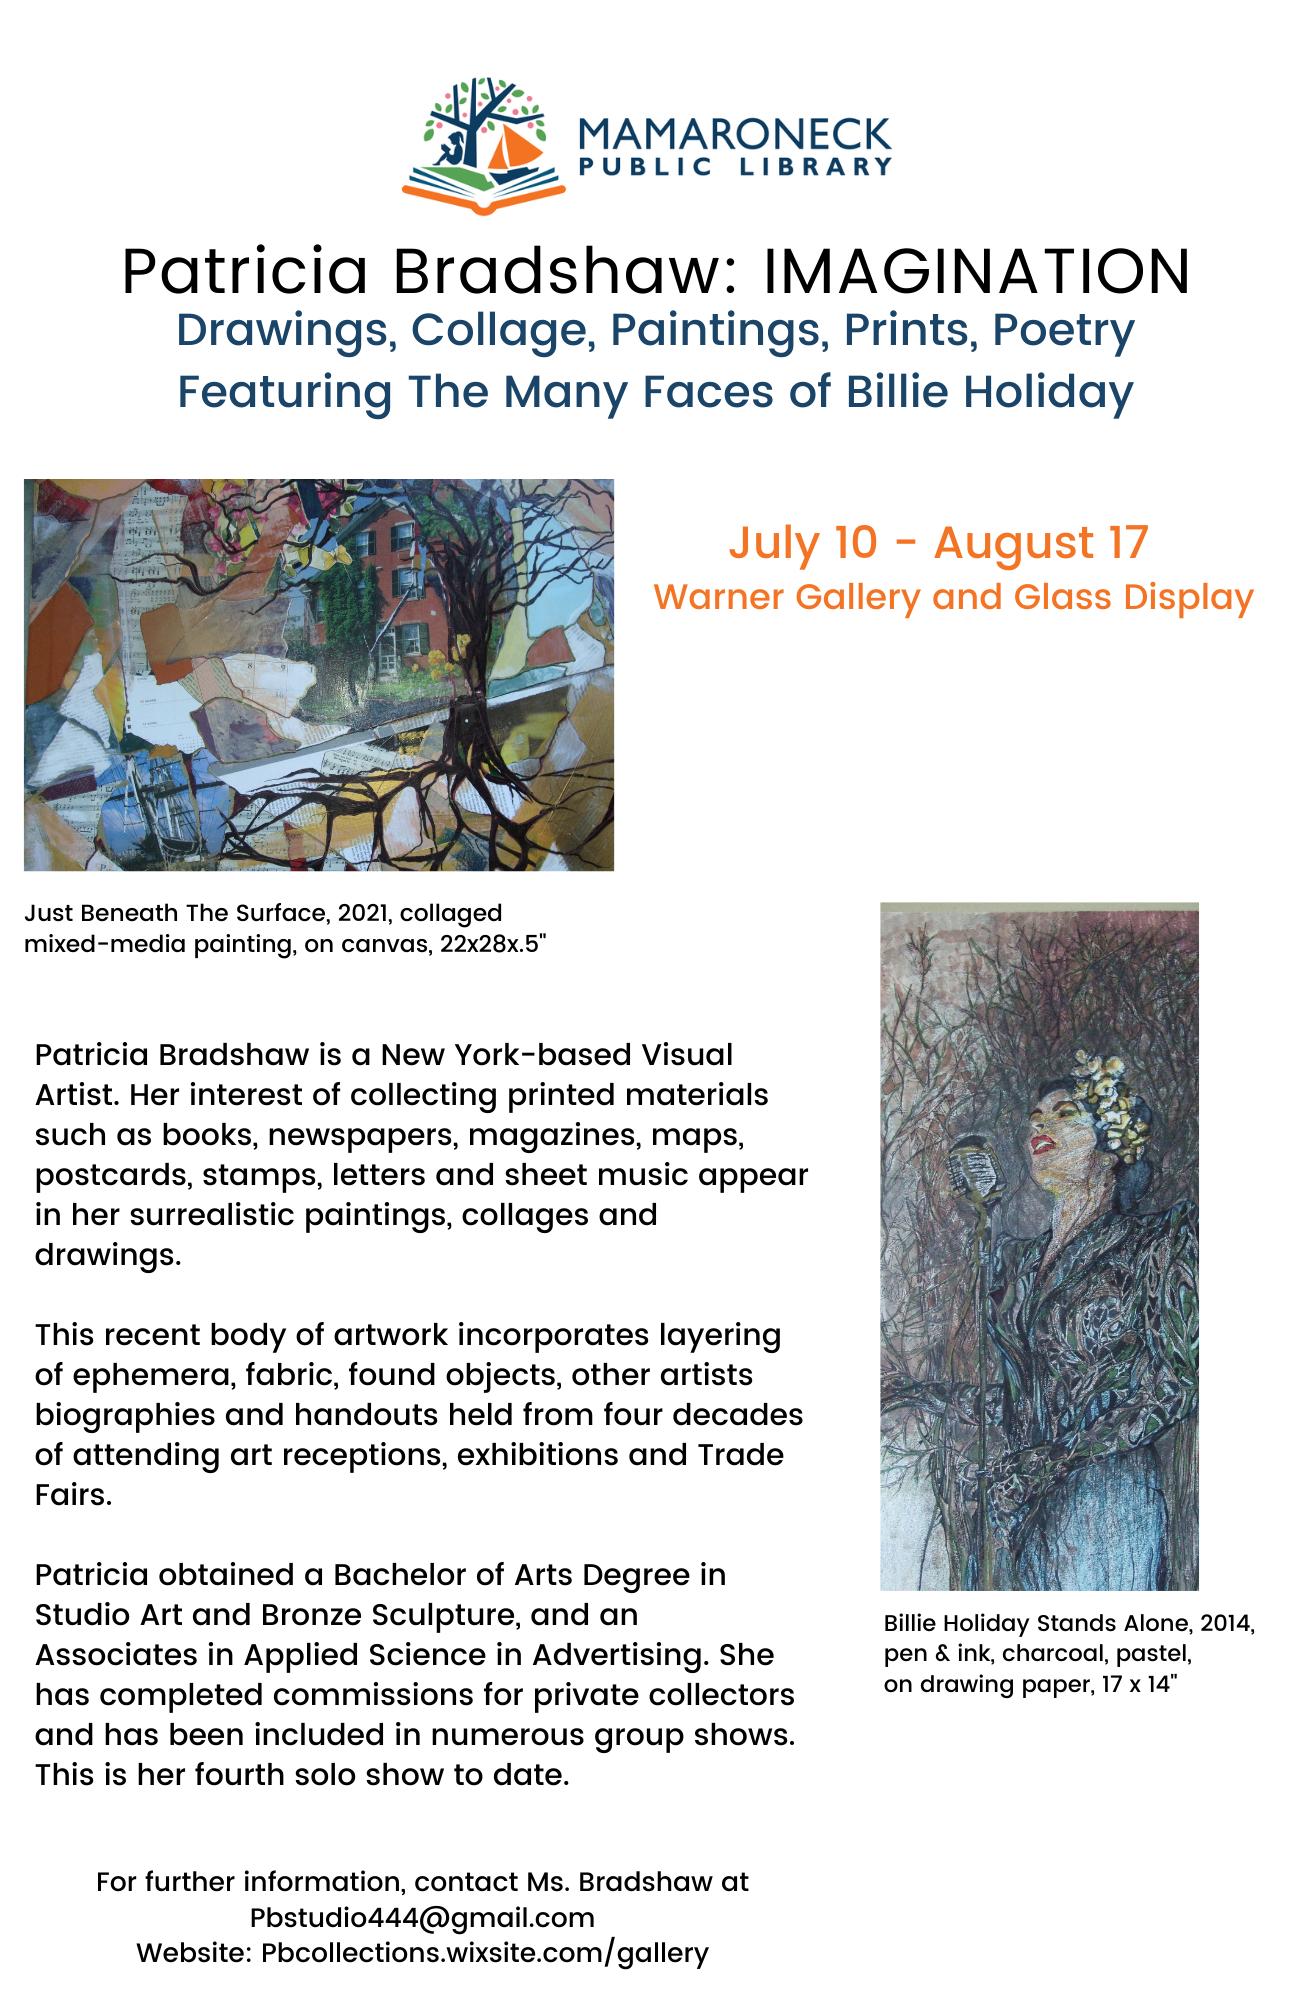 Imagination - new artist display in Warner Gallery & Glass Display Case